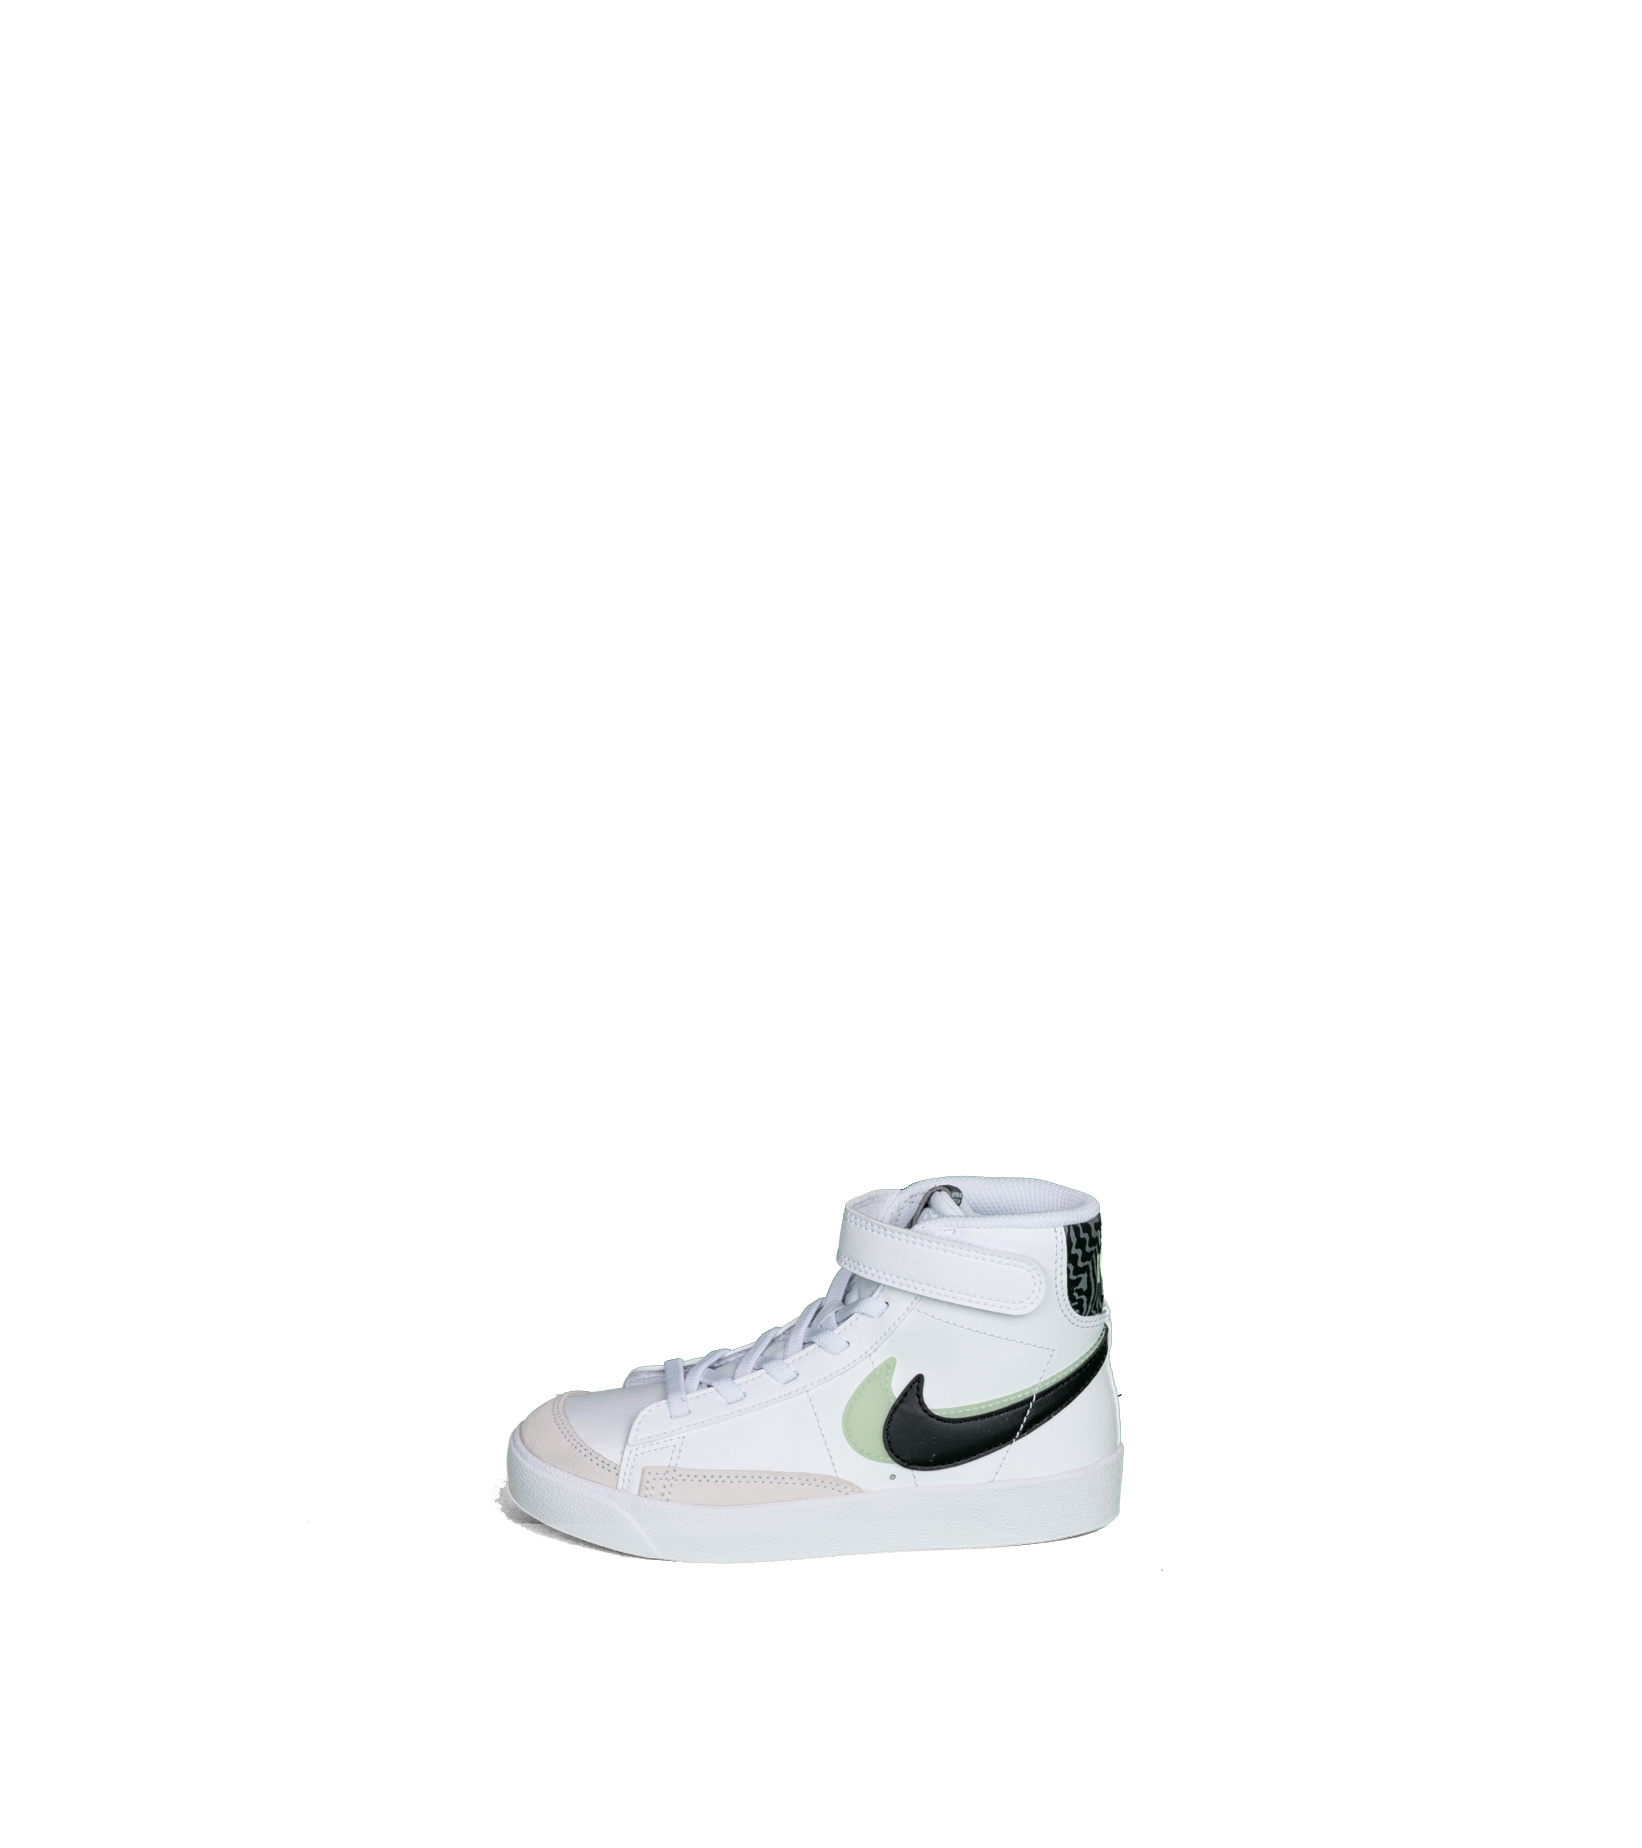 "Blazer Mid '77 SE (PS)  ""White/Vapor Green""-3"